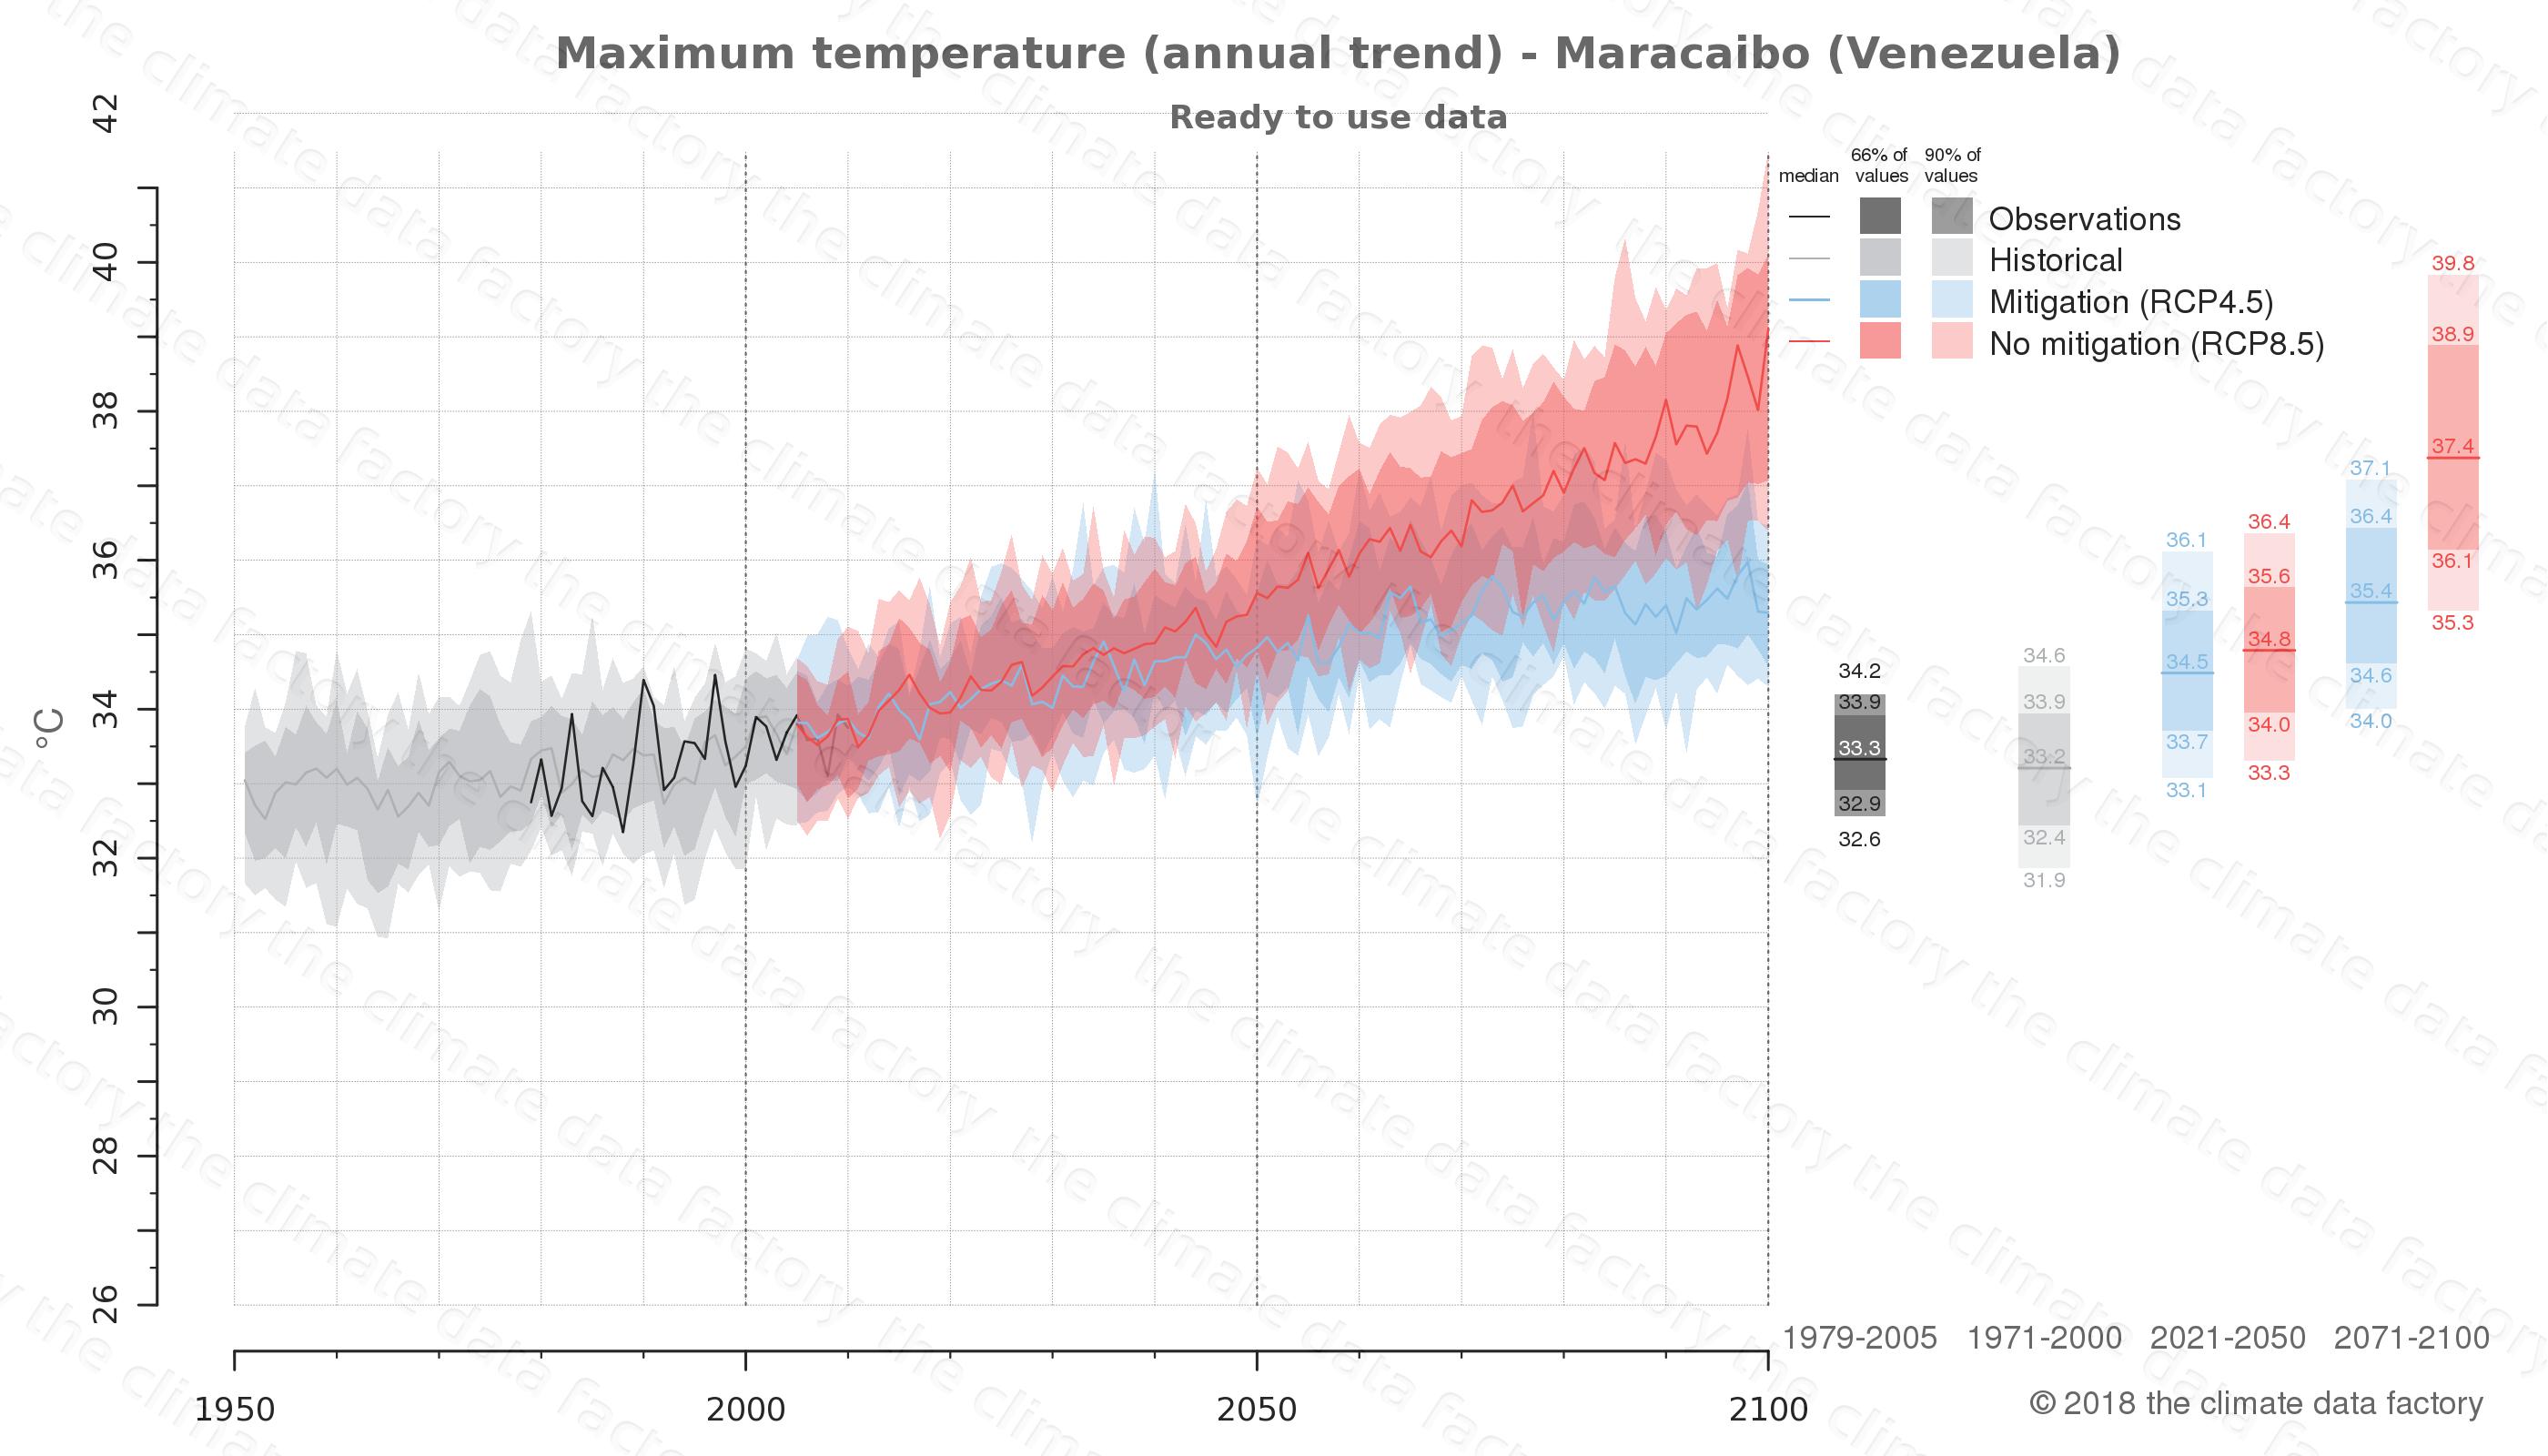 climate change data policy adaptation climate graph city data maximum-temperature maracaibo venezuela